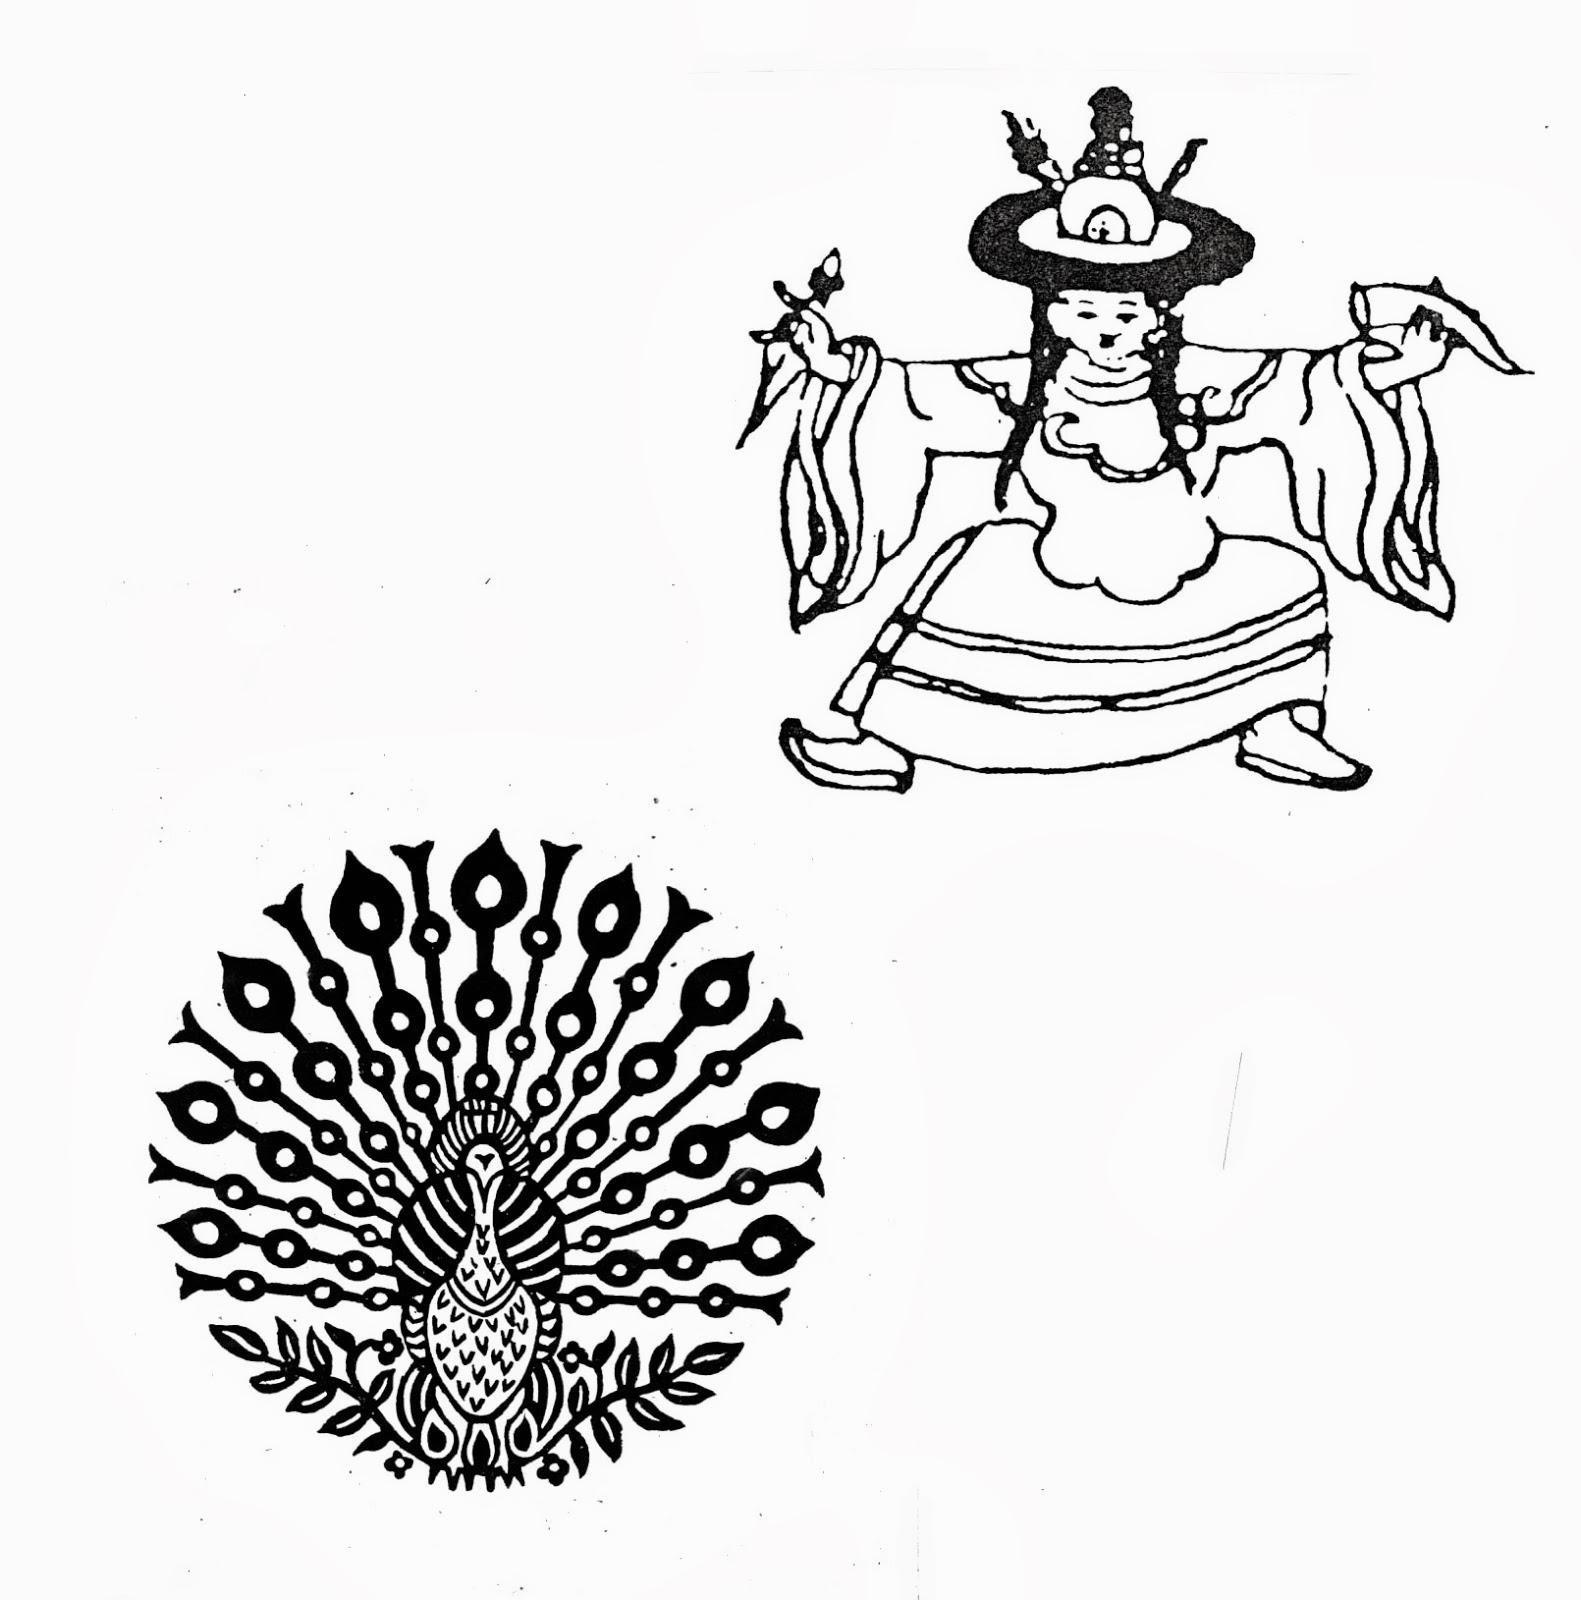 Tibeto logic the vajra as implement emblem and symbol buycottarizona Images